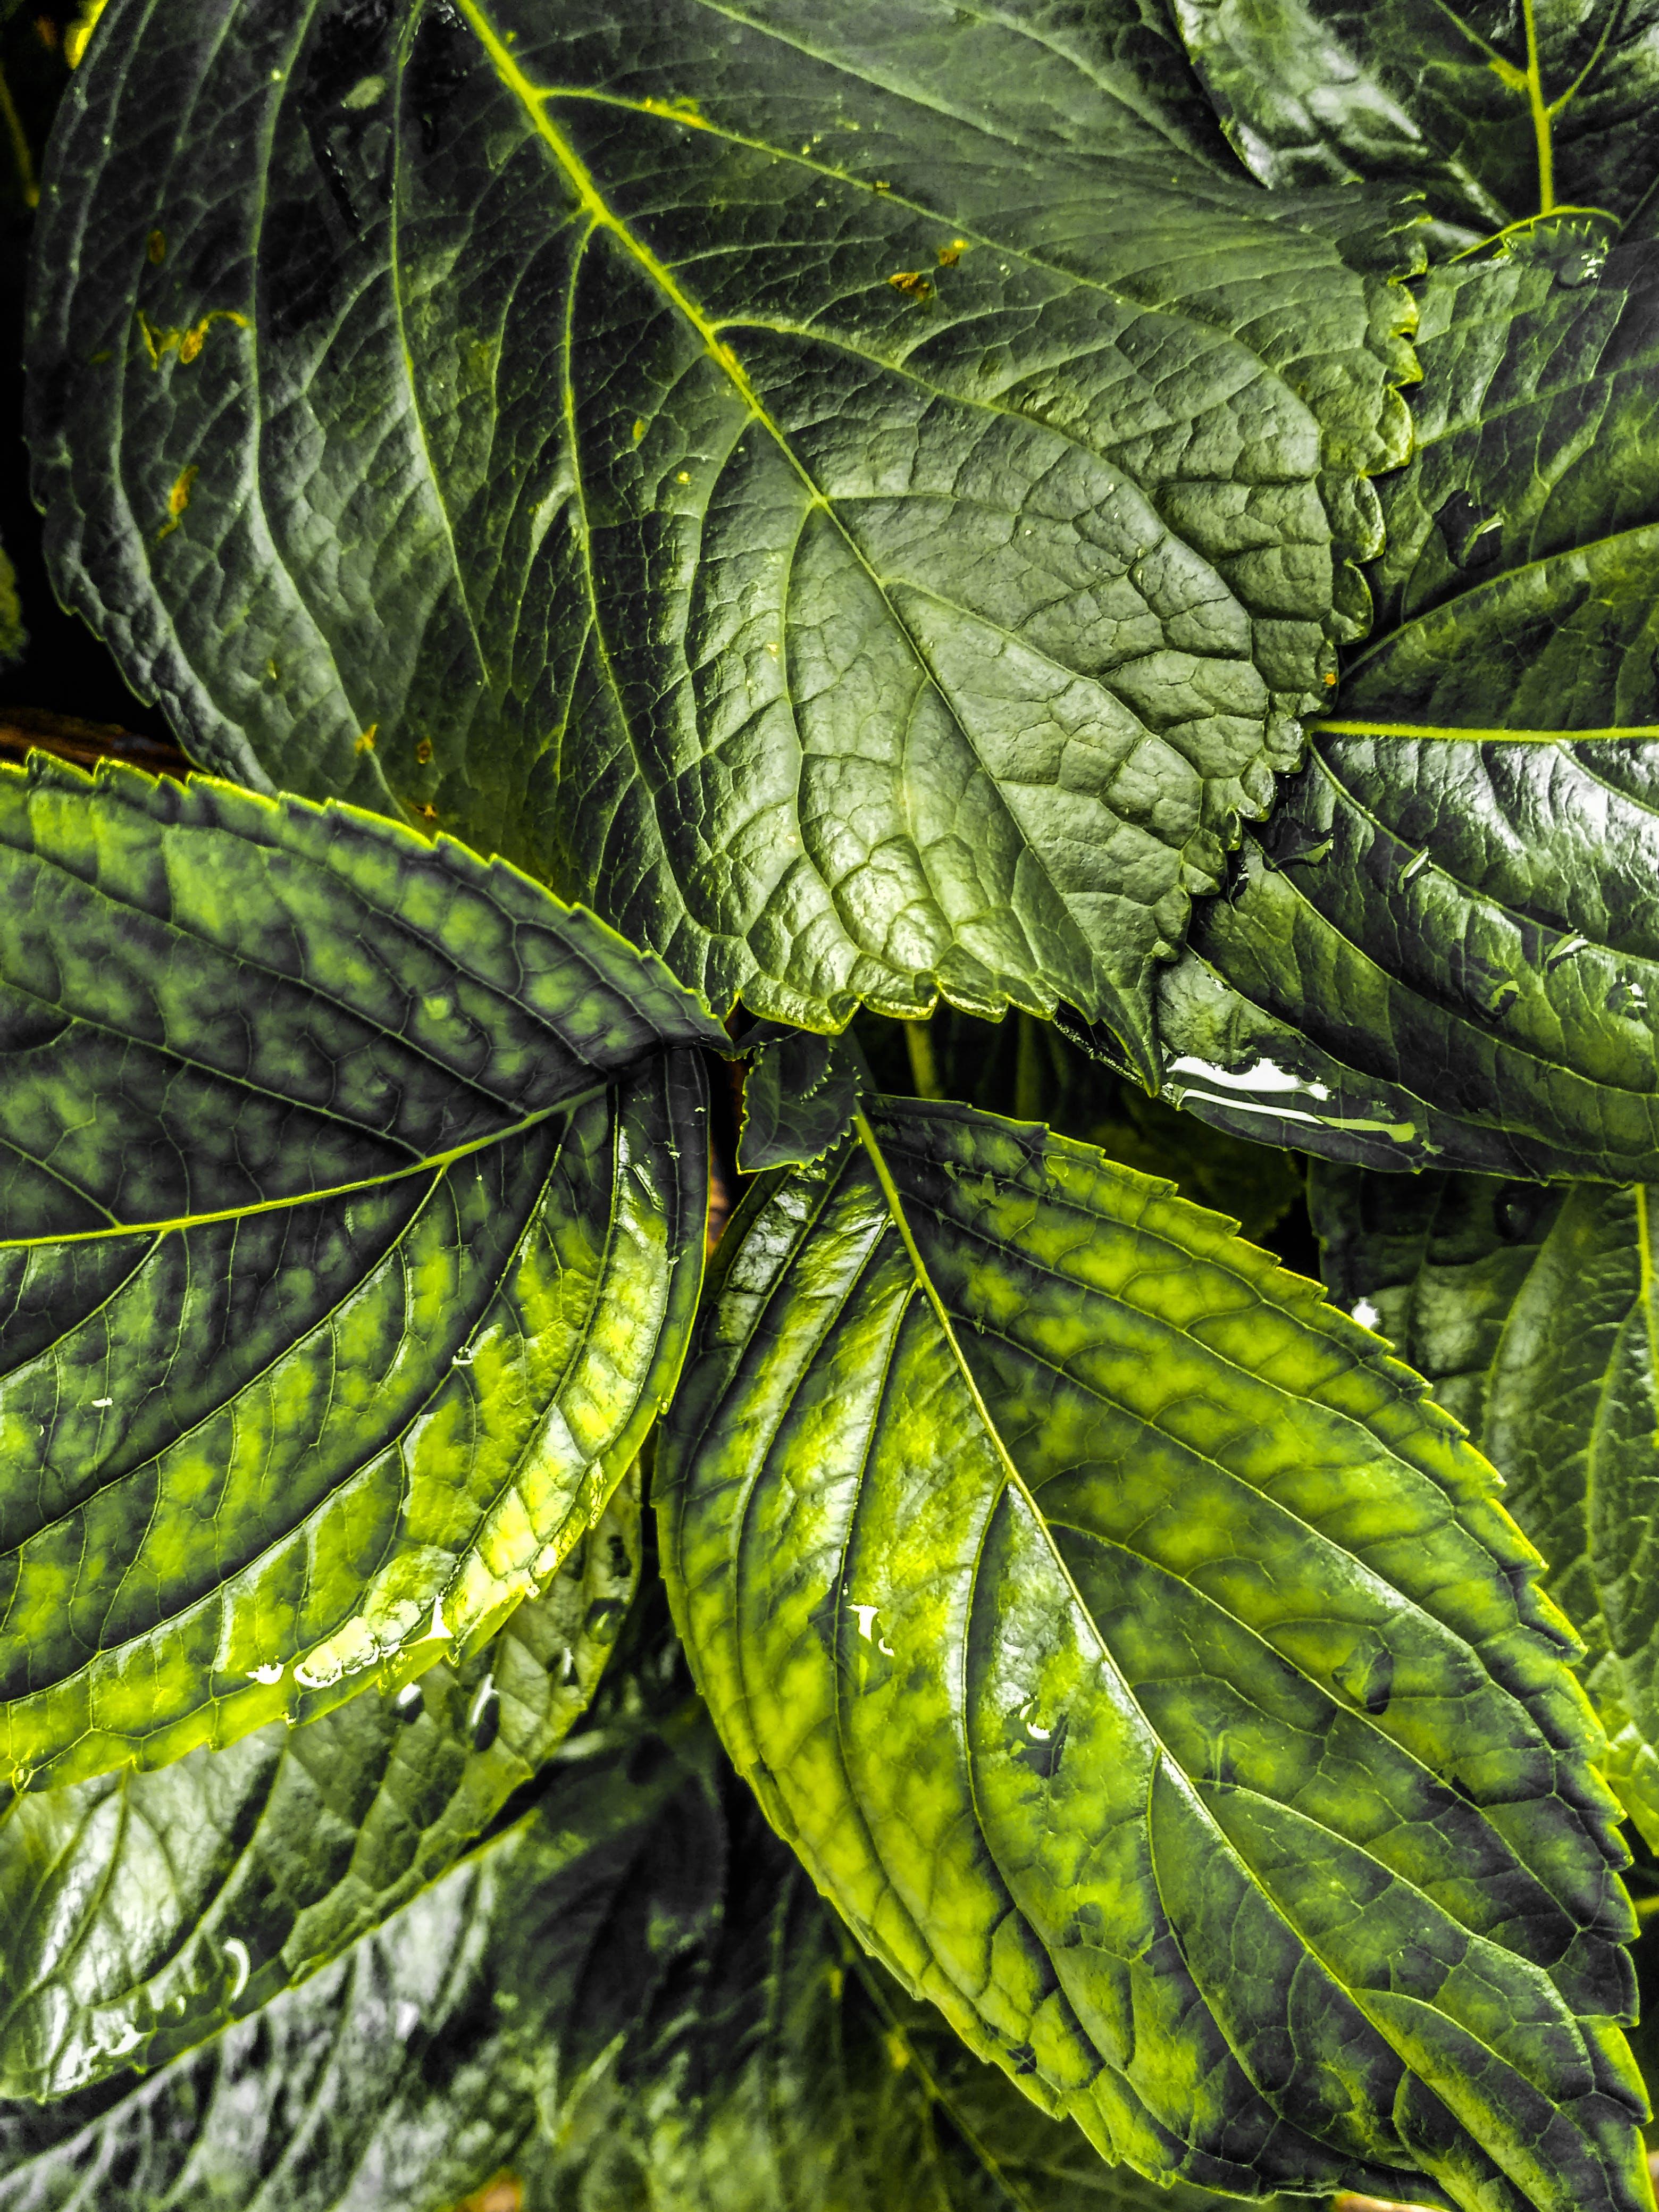 Free stock photo of dark green, dark green plants, fallen leaves